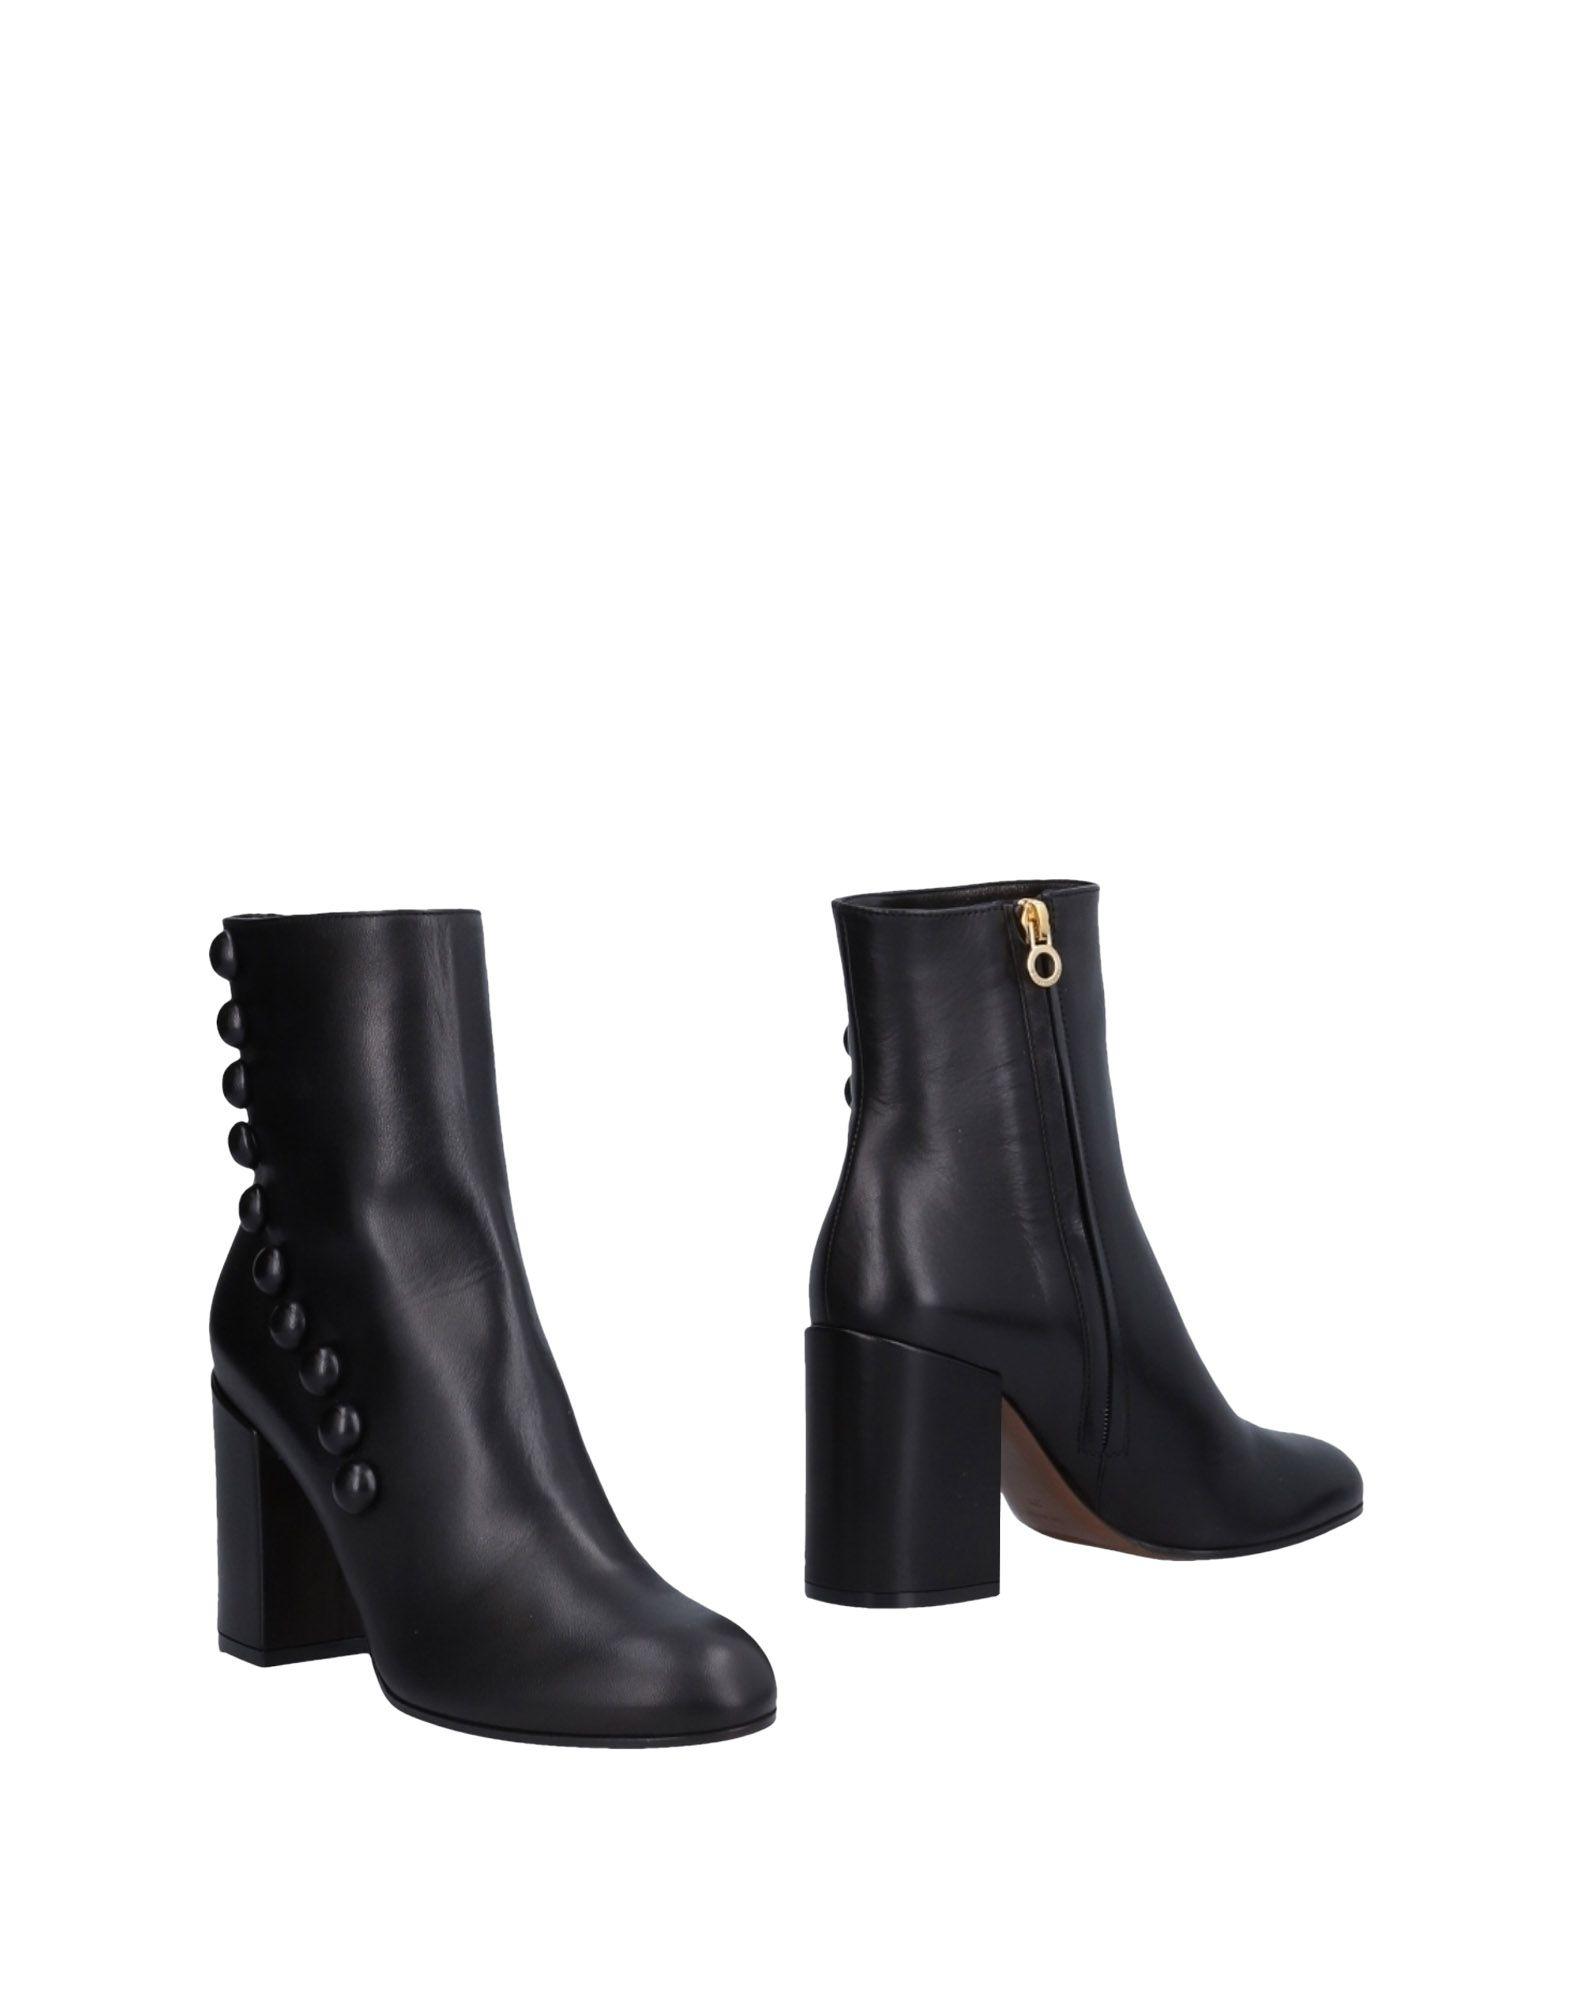 Rabatt Chose Schuhe L' Autre Chose Rabatt Stiefelette Damen  11484095KF 45e781